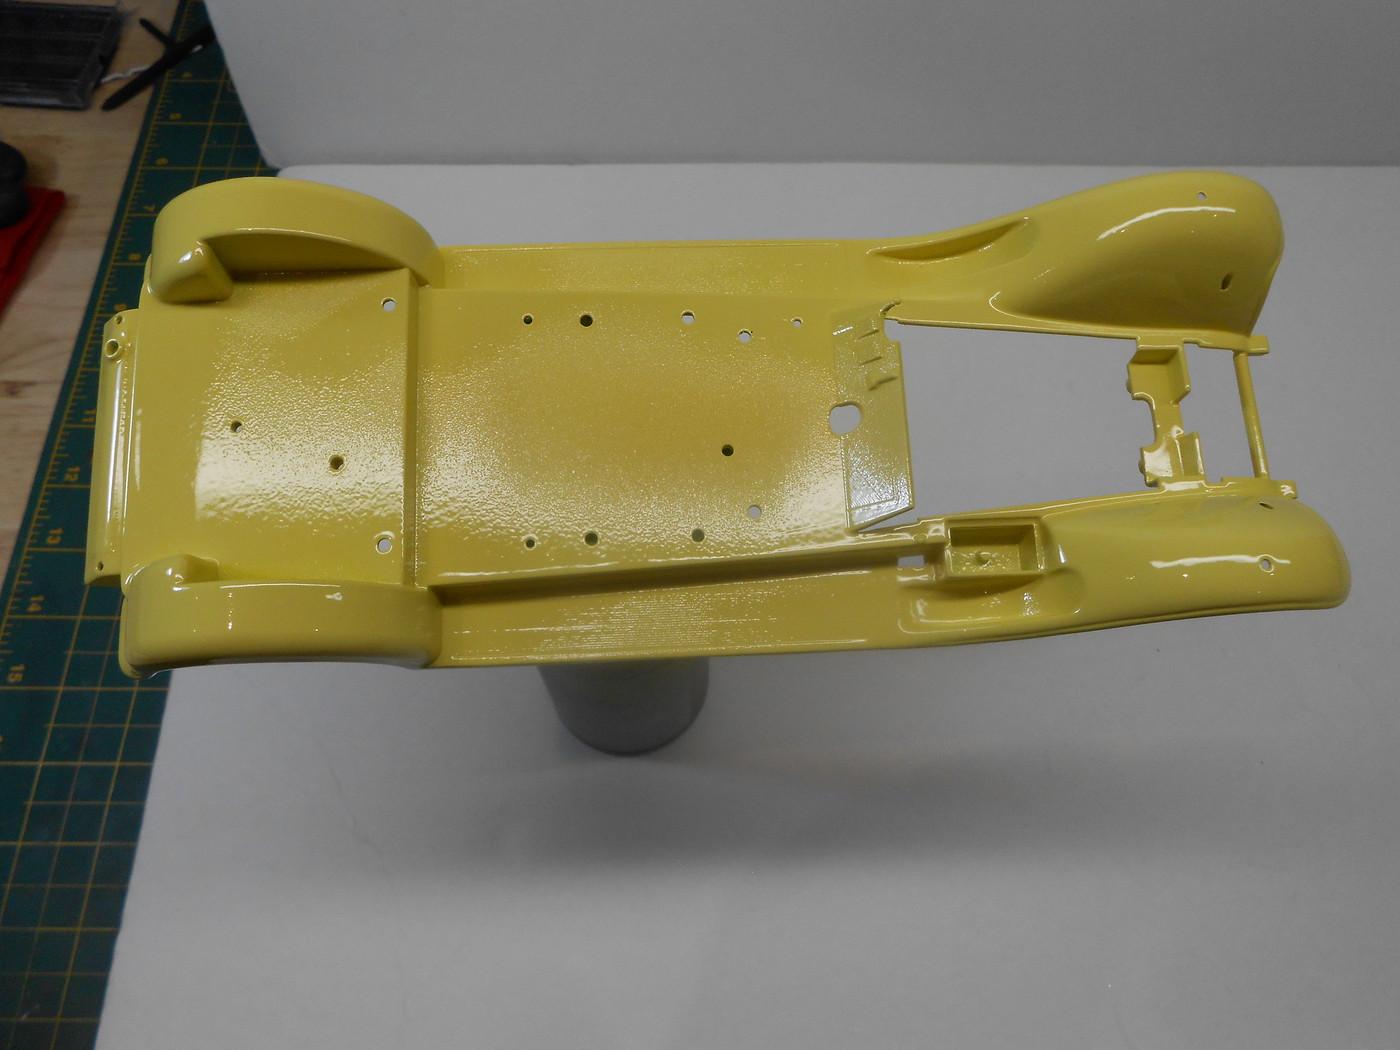 1930 Packard Sport Pheaton - Page 2 2v2EG6CuCxaTfRW